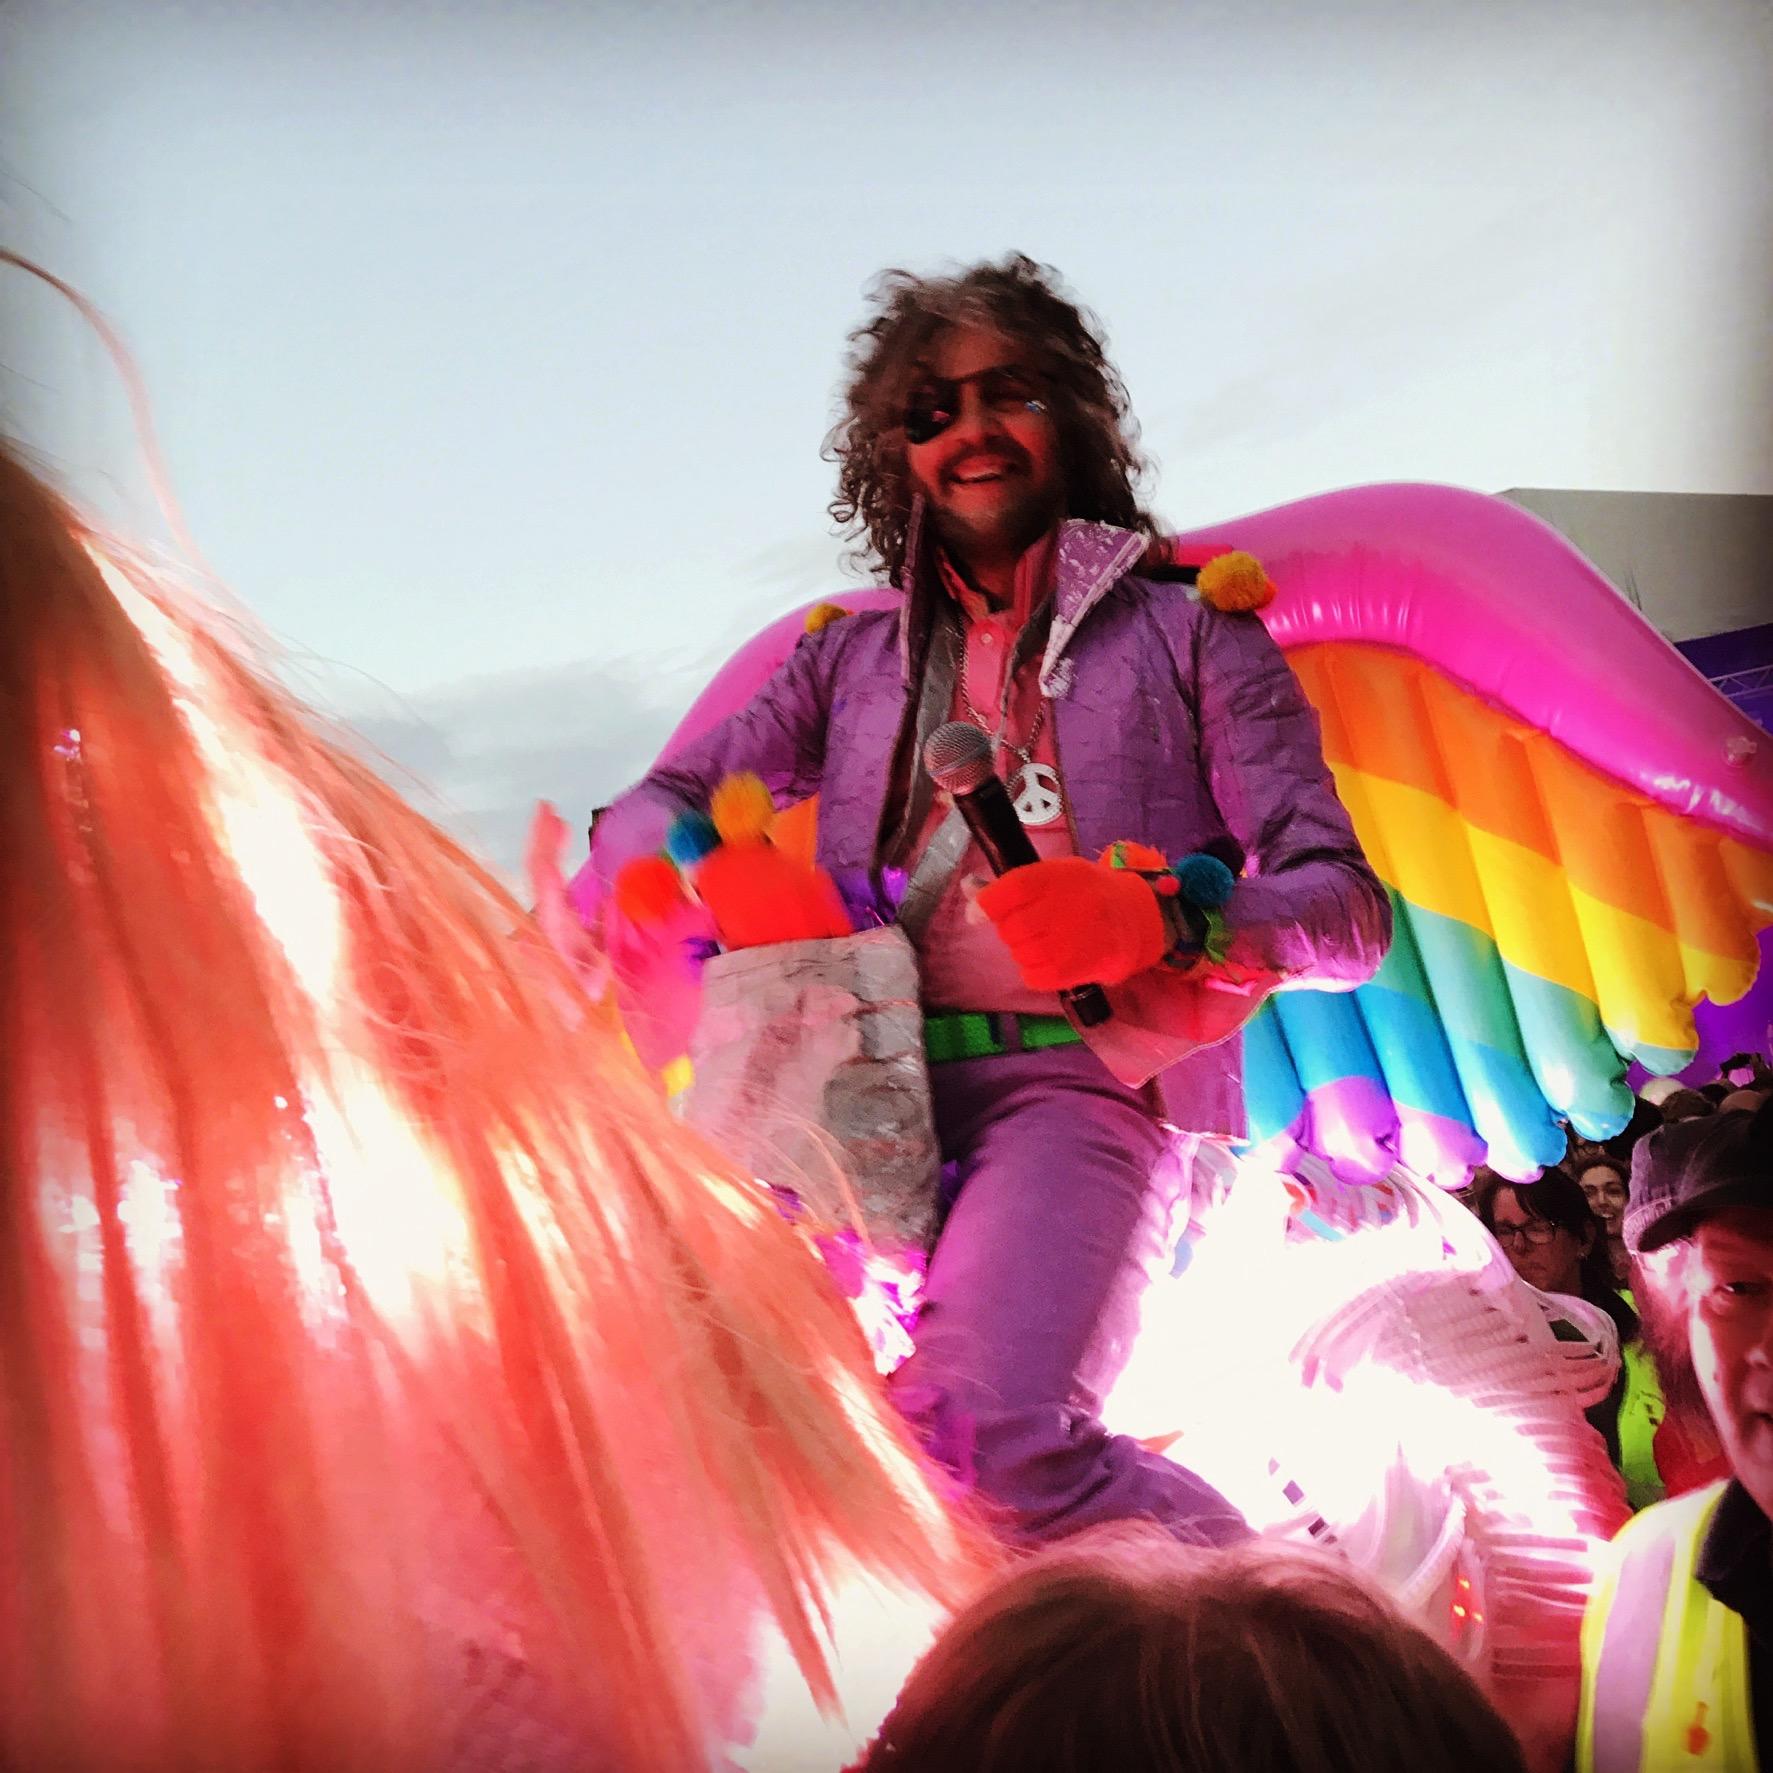 Wayne Coyne. On a unicorn. In Hull. BELIEVE IT! (pic by Tim Drage)